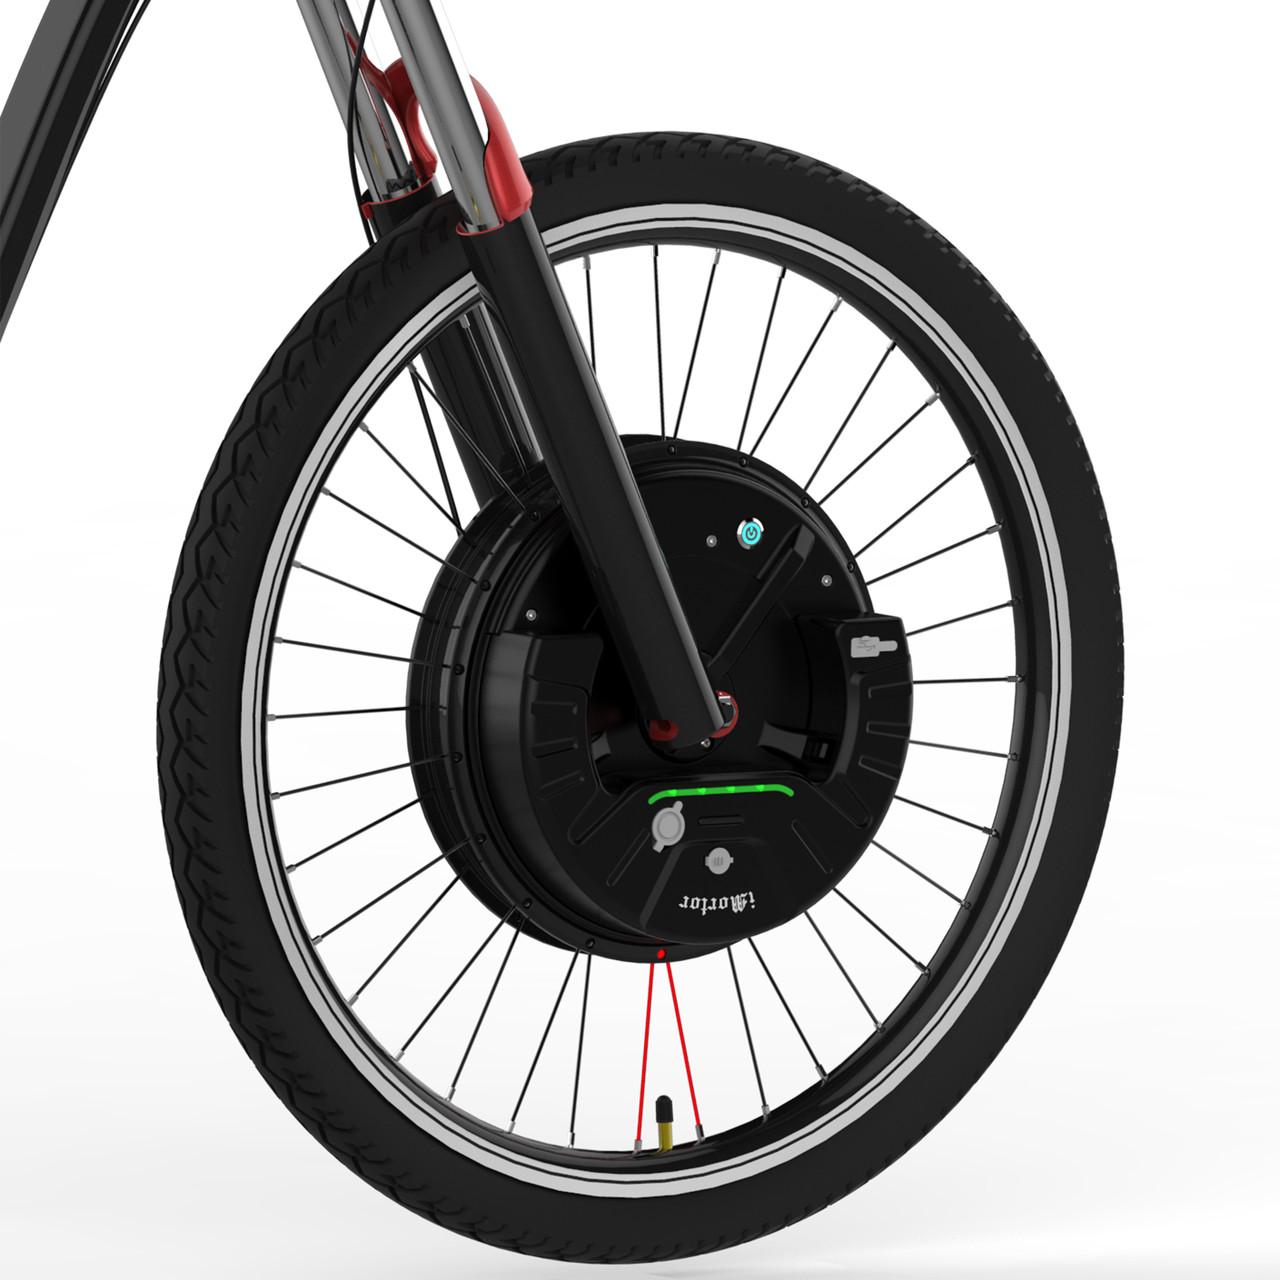 Электронабор  для велосипеда  iMortor III, переднее мотор-колесо 36v 800w.+акк. 36v 7,2A/H. 26''